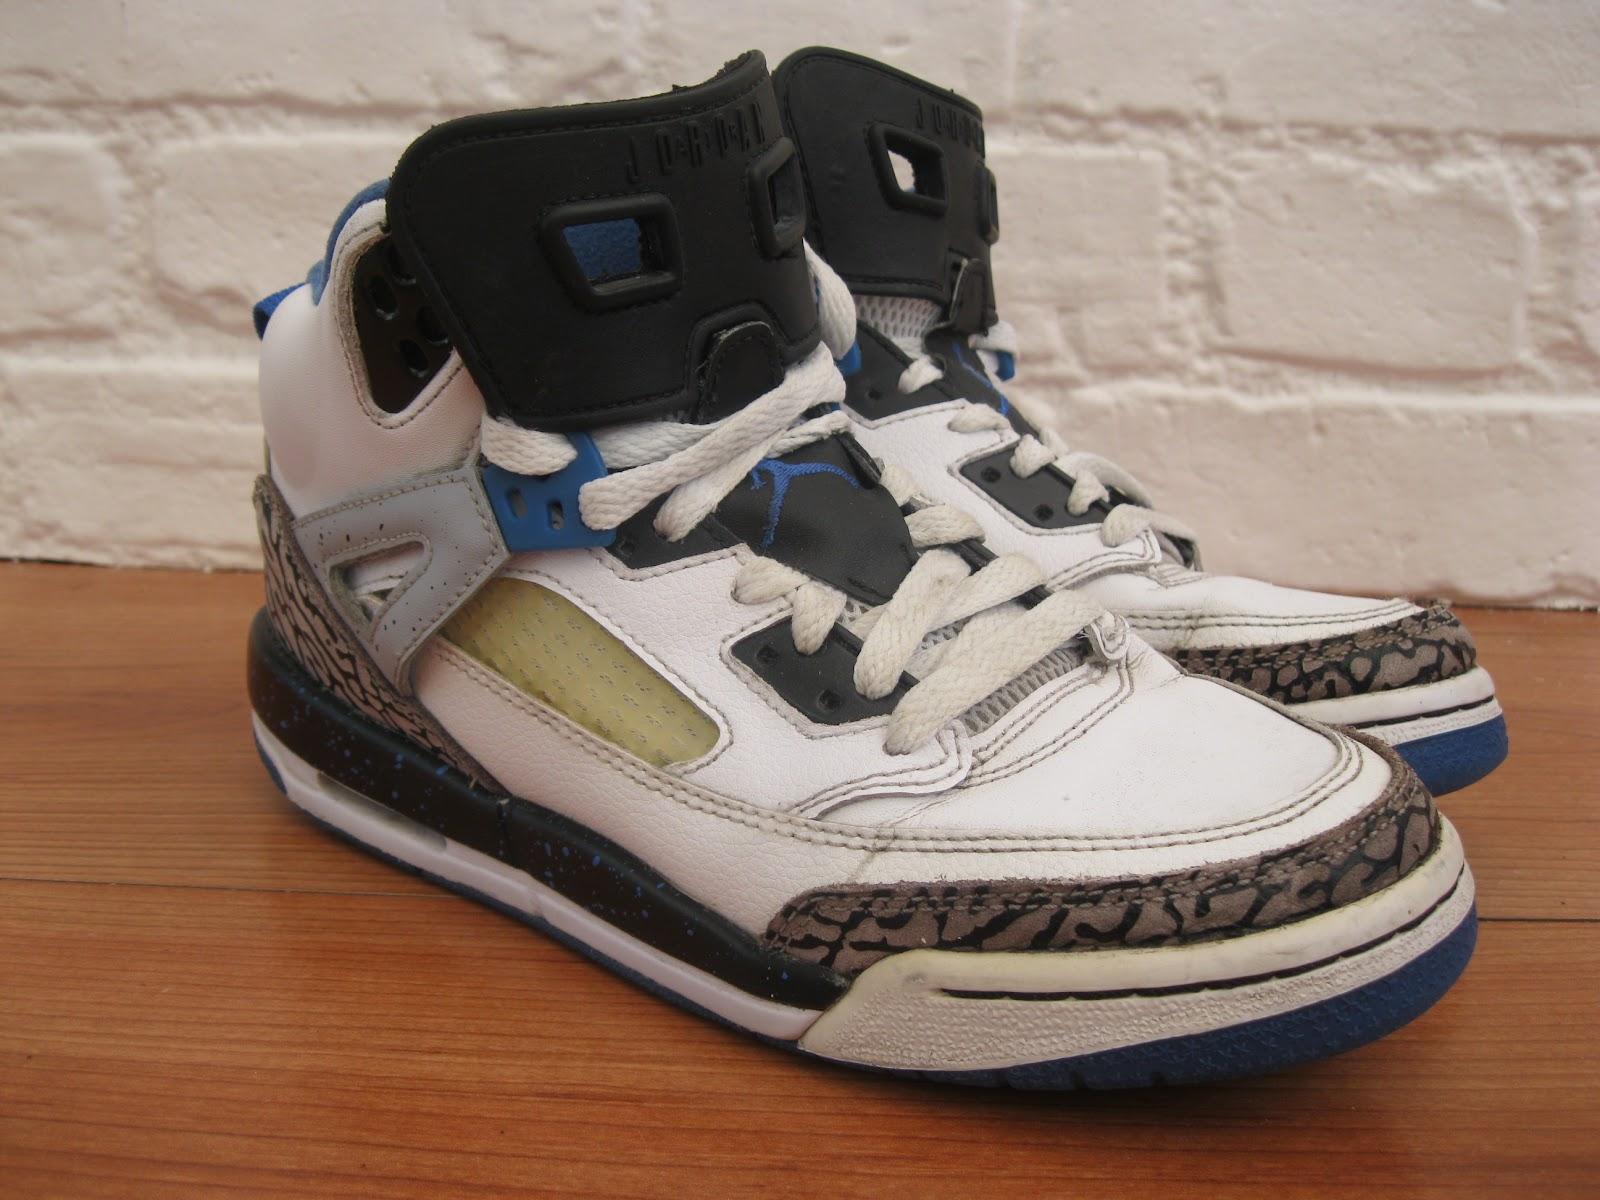 88cd62b6ea26 nike air jordan spizike size Find great deals for Nike Women s Shox Deliver  ...